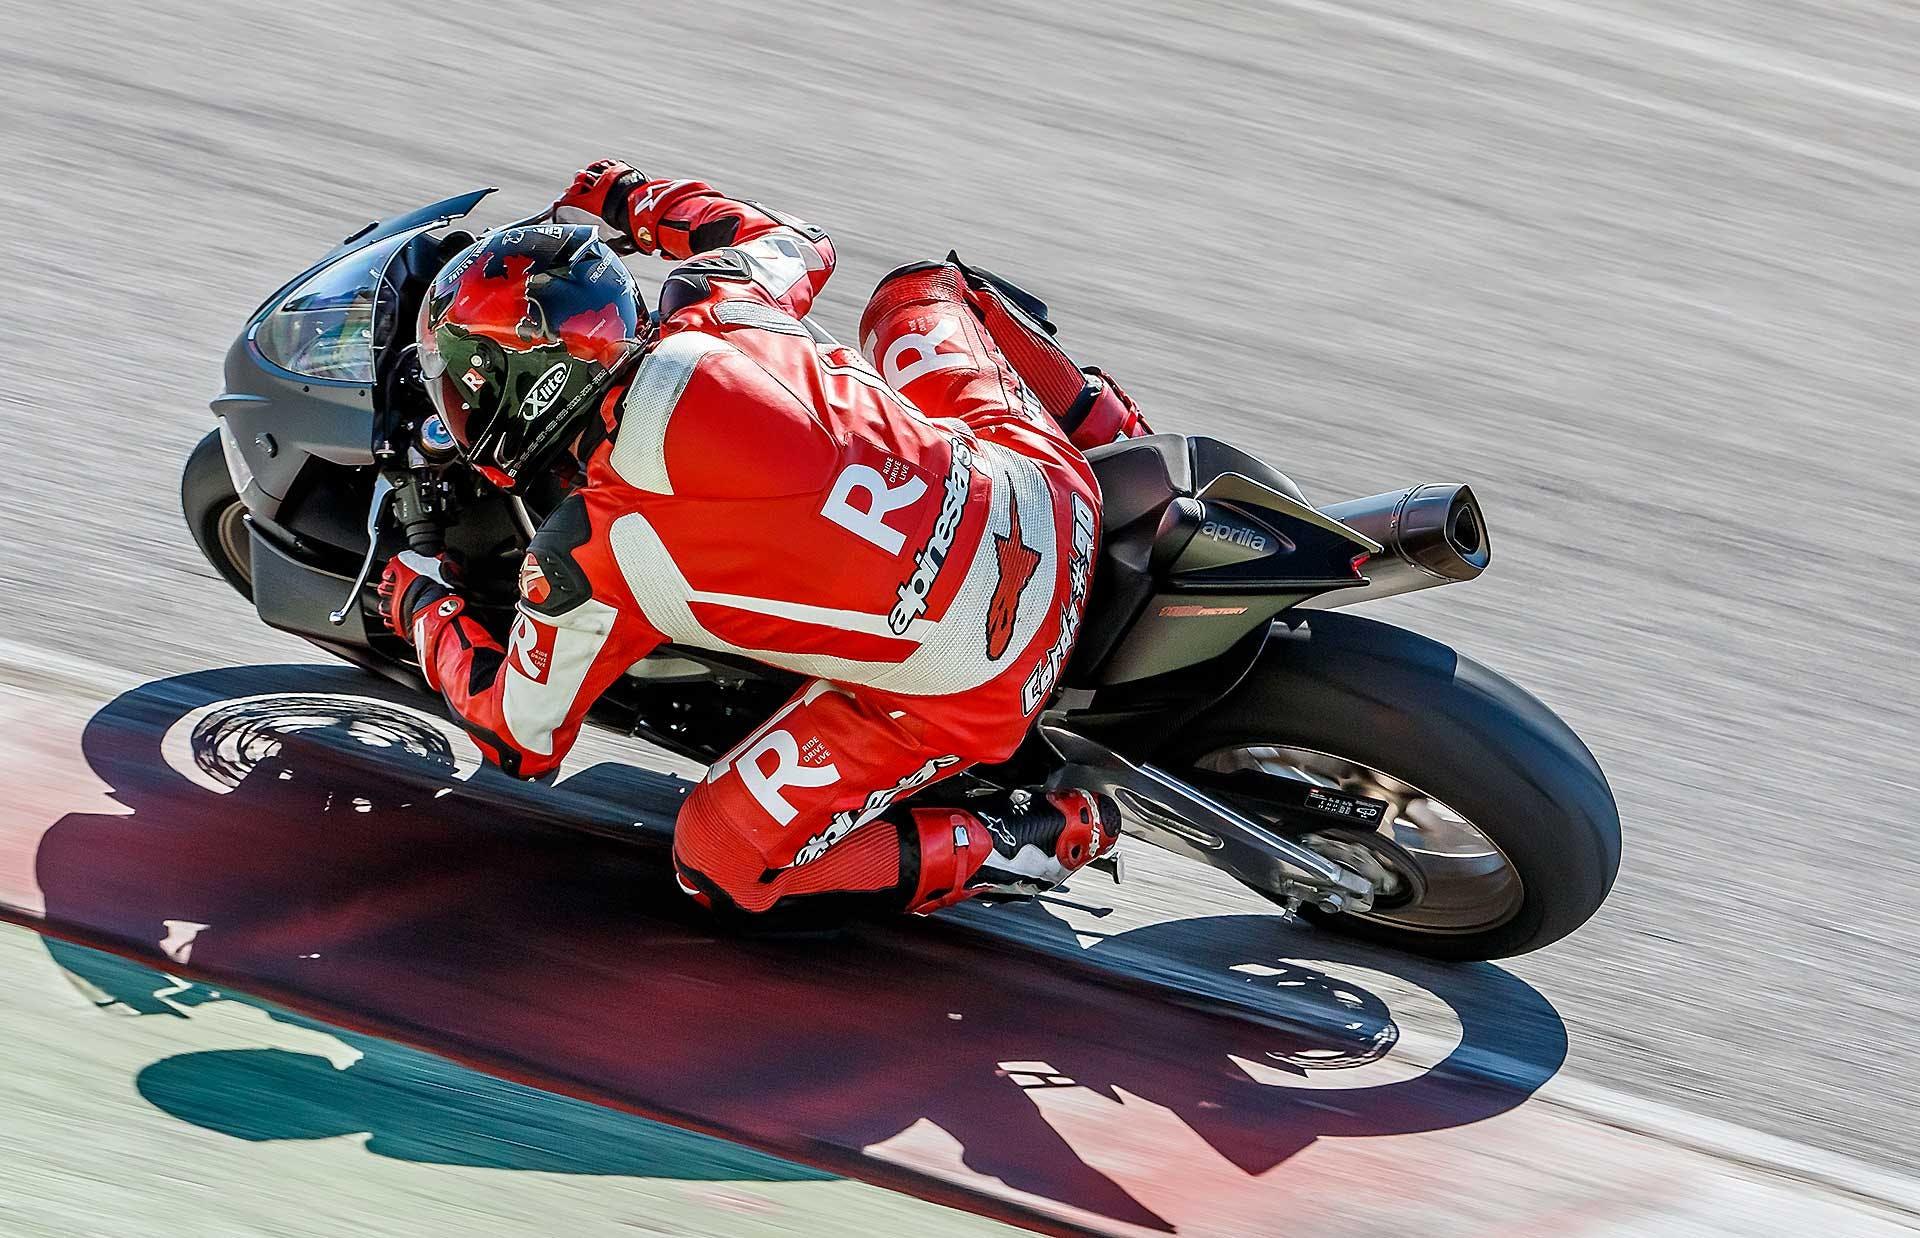 Aprilia RSV4 1100 Factory moto piega curva pista